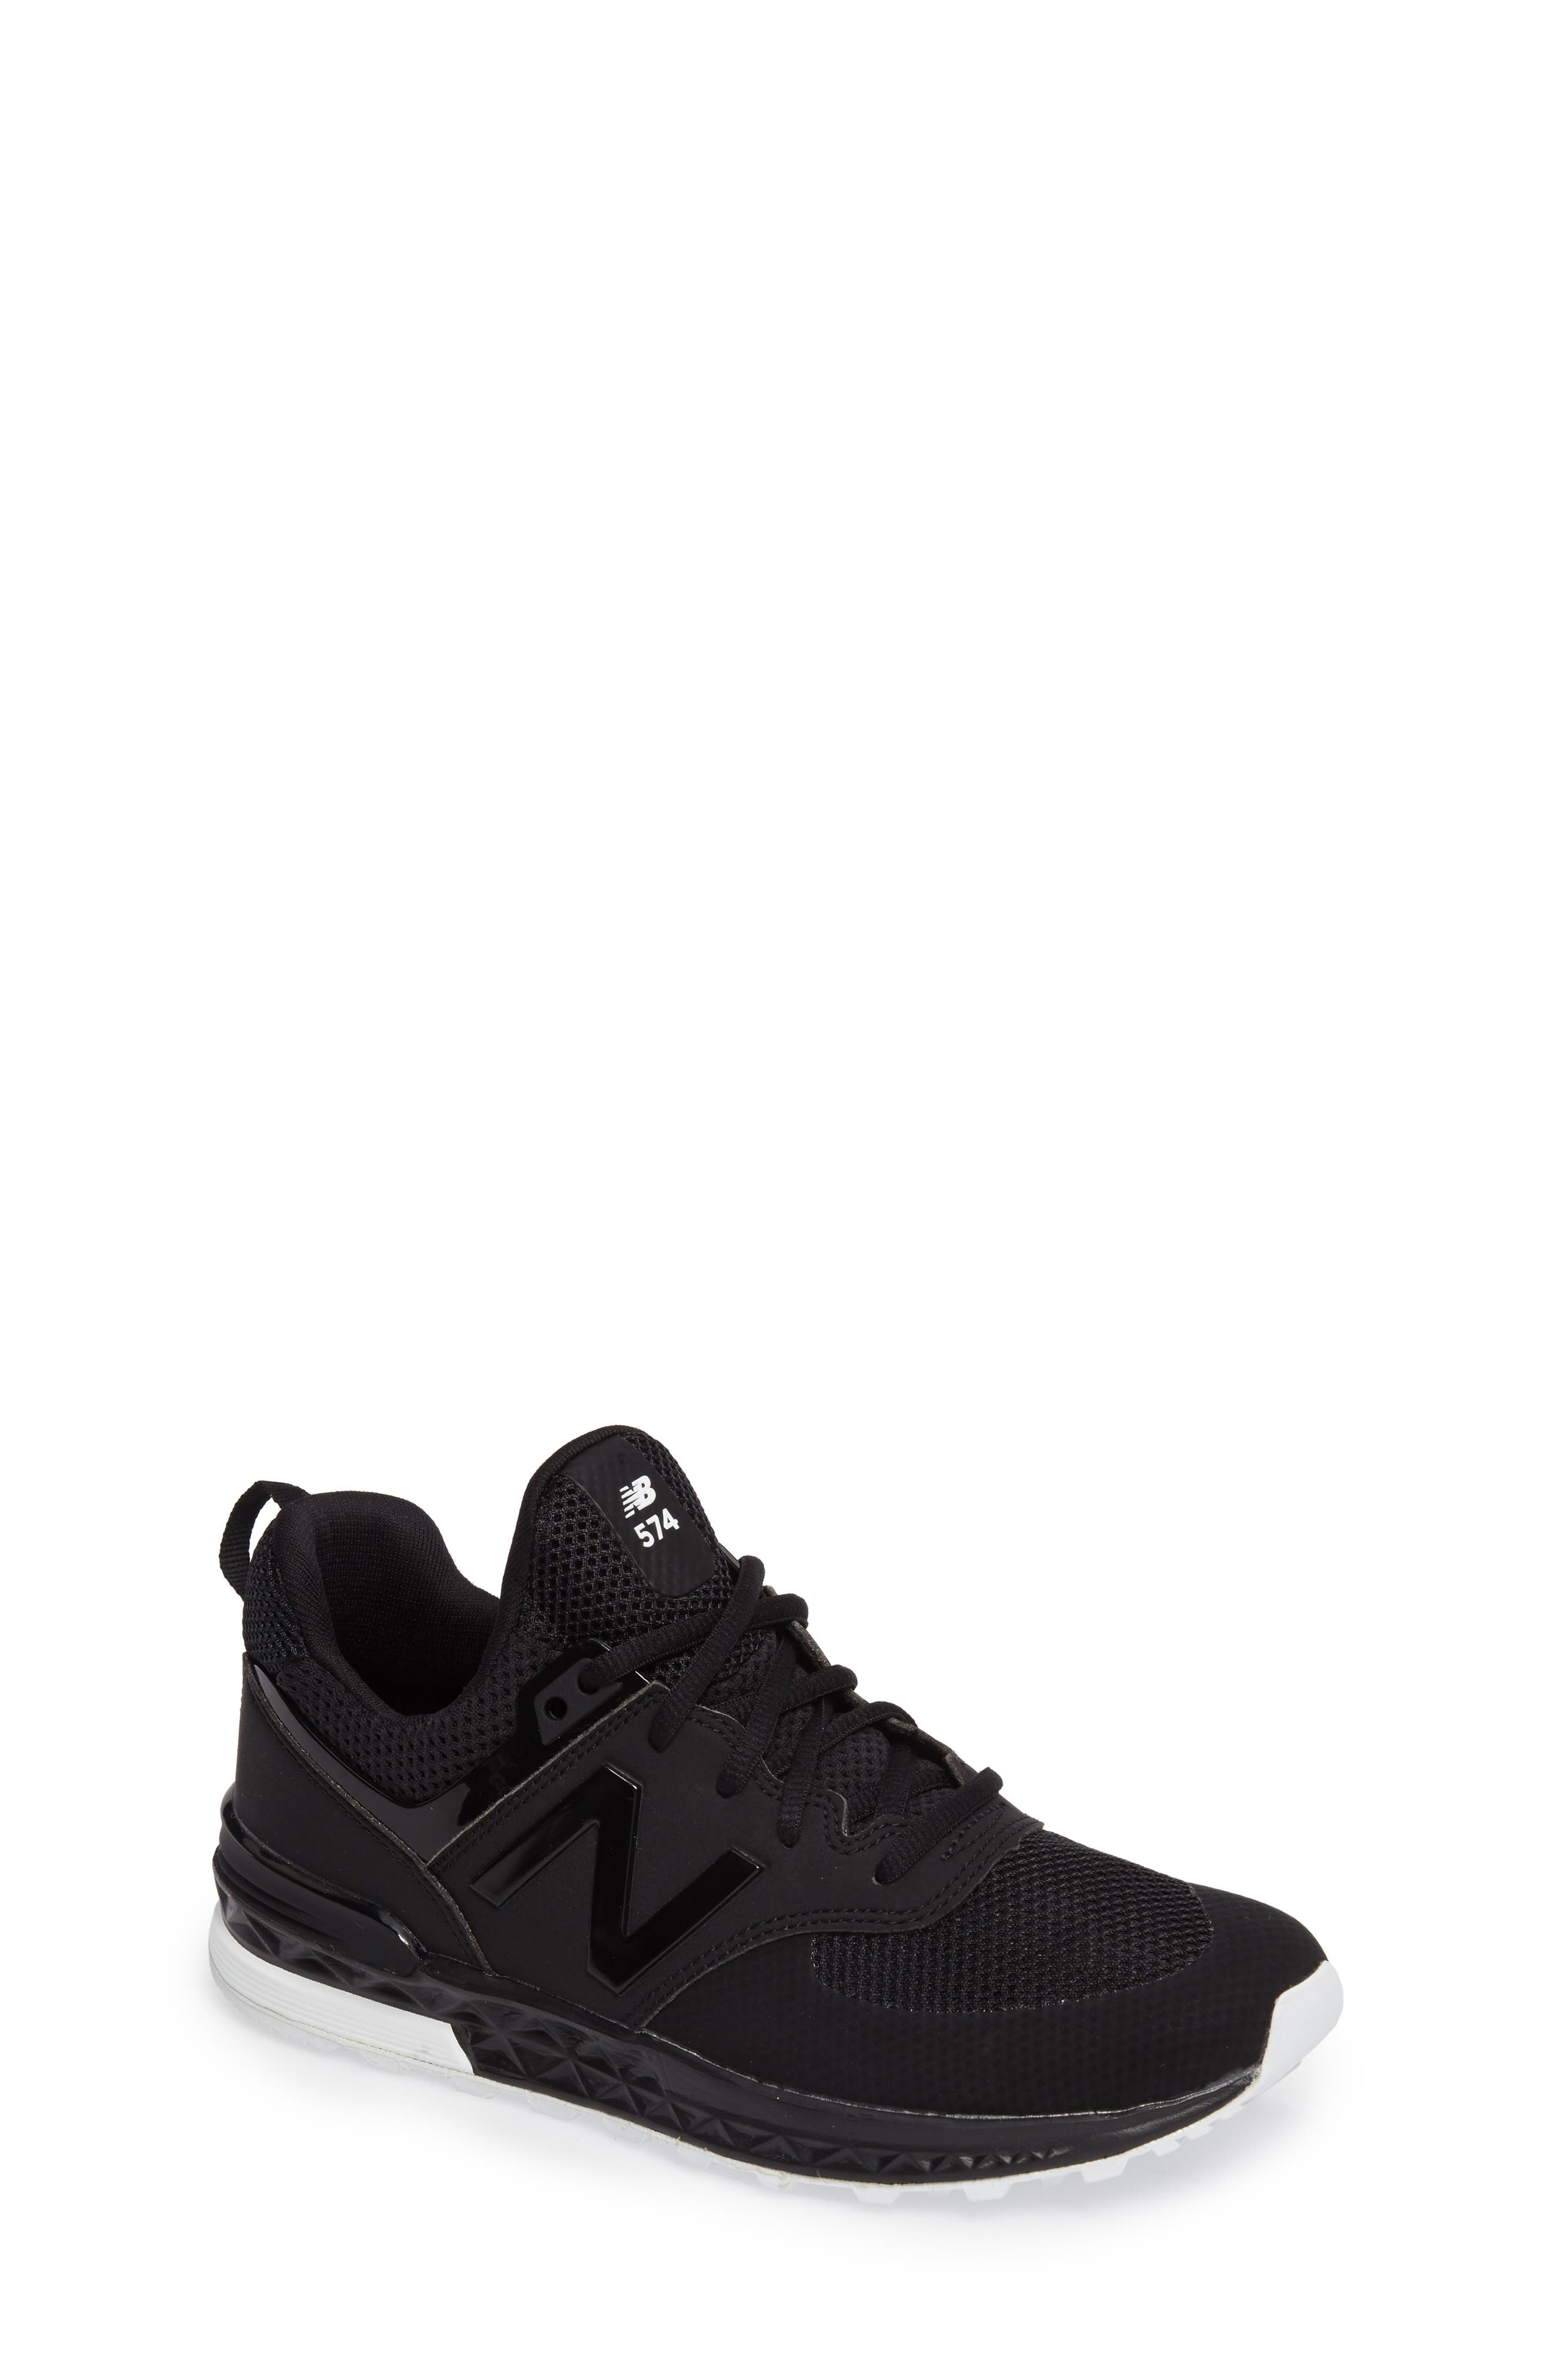 574 Sport Sneaker,                         Main,                         color, Black